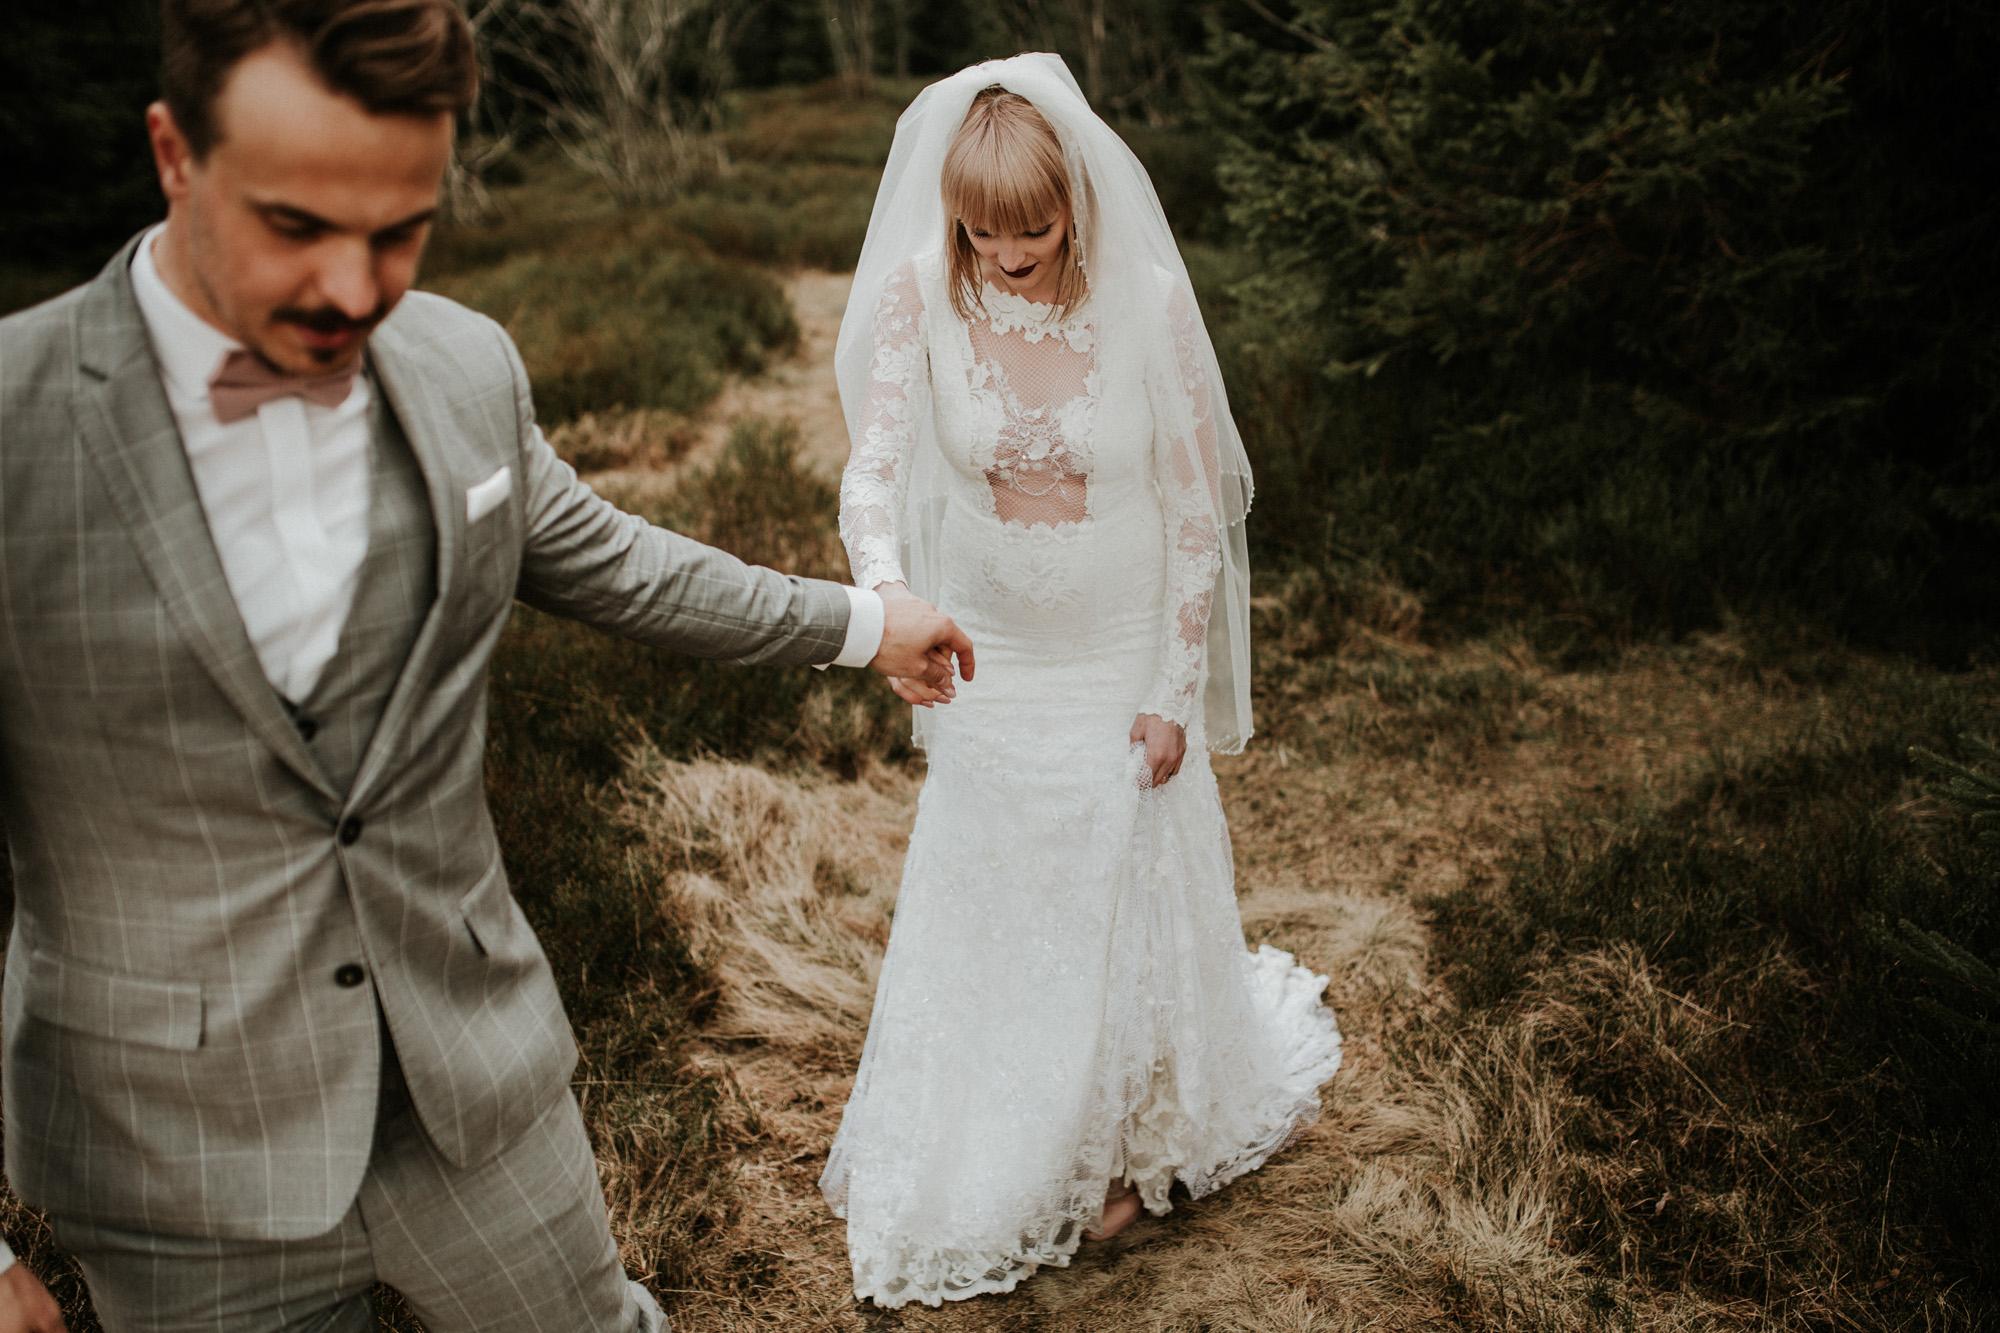 DanielaMarquardtPhotography_Hochzeitsfotograf_Düsseldorf_Köln_Mallorca_Bayern_Austria_Harz_LinaundMaik_Afterwedding-Shooting_Weddingphotographer_Ibiza_Tuskany_Italien_Toskana74